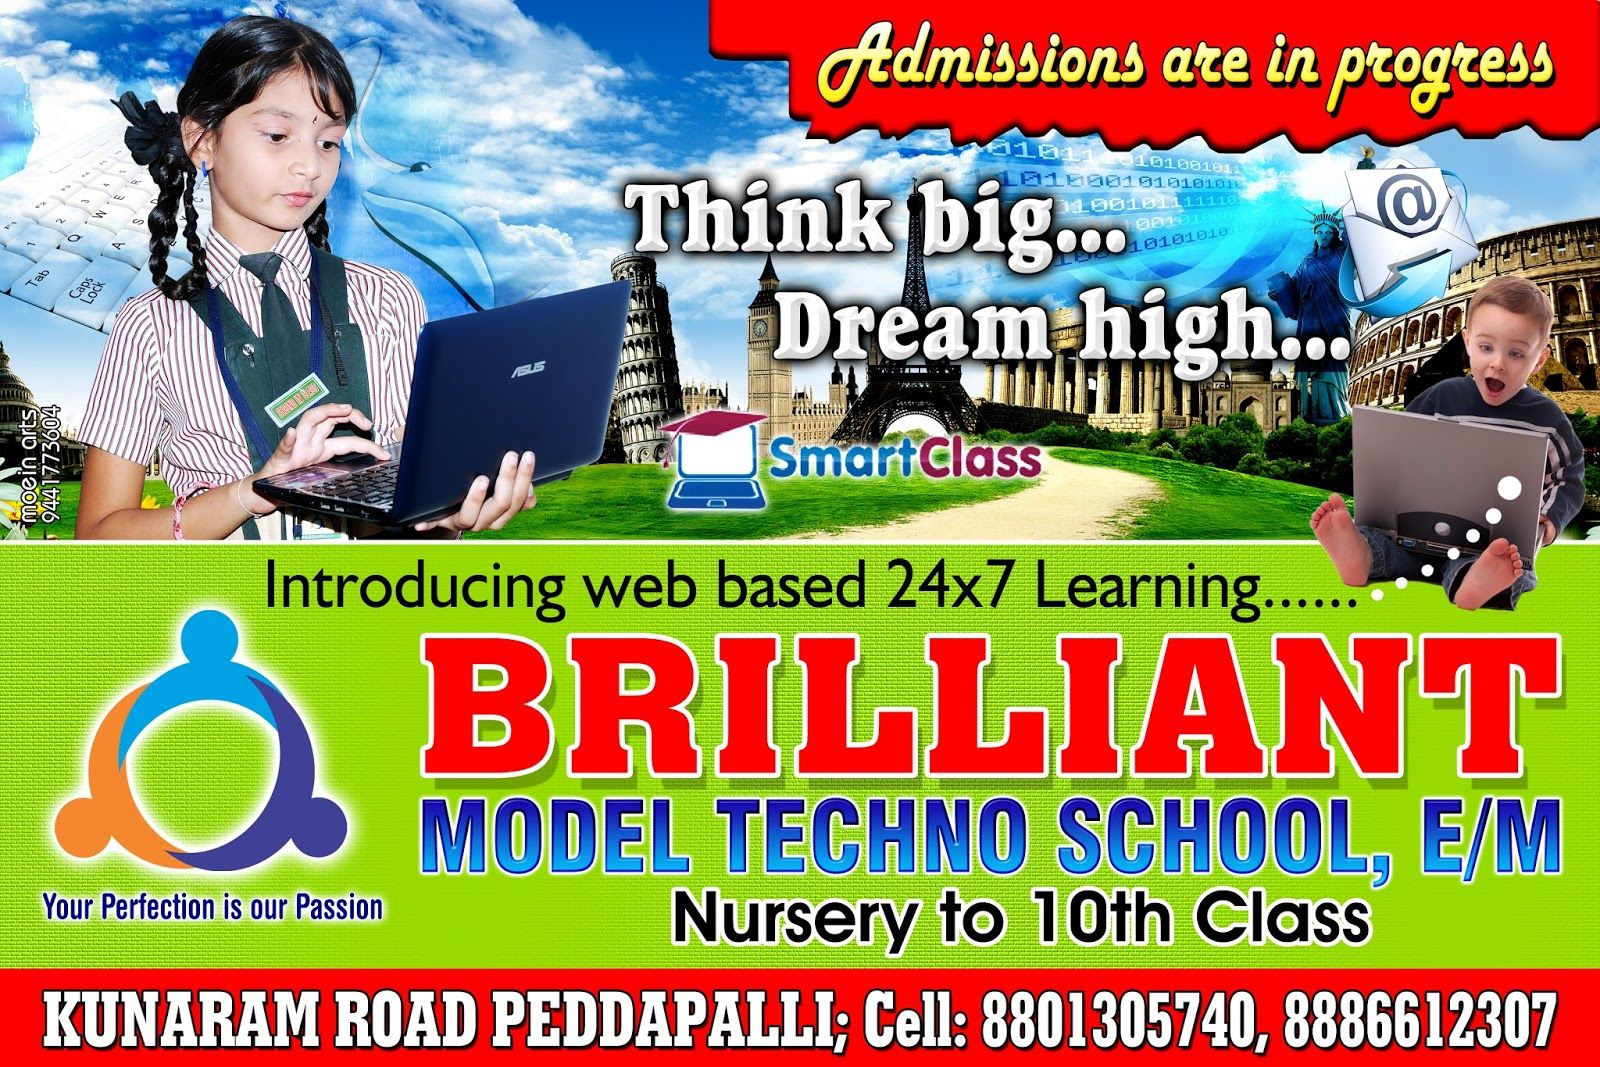 school-banner-photoshop-psd-template-free-downloads | School Flex ...